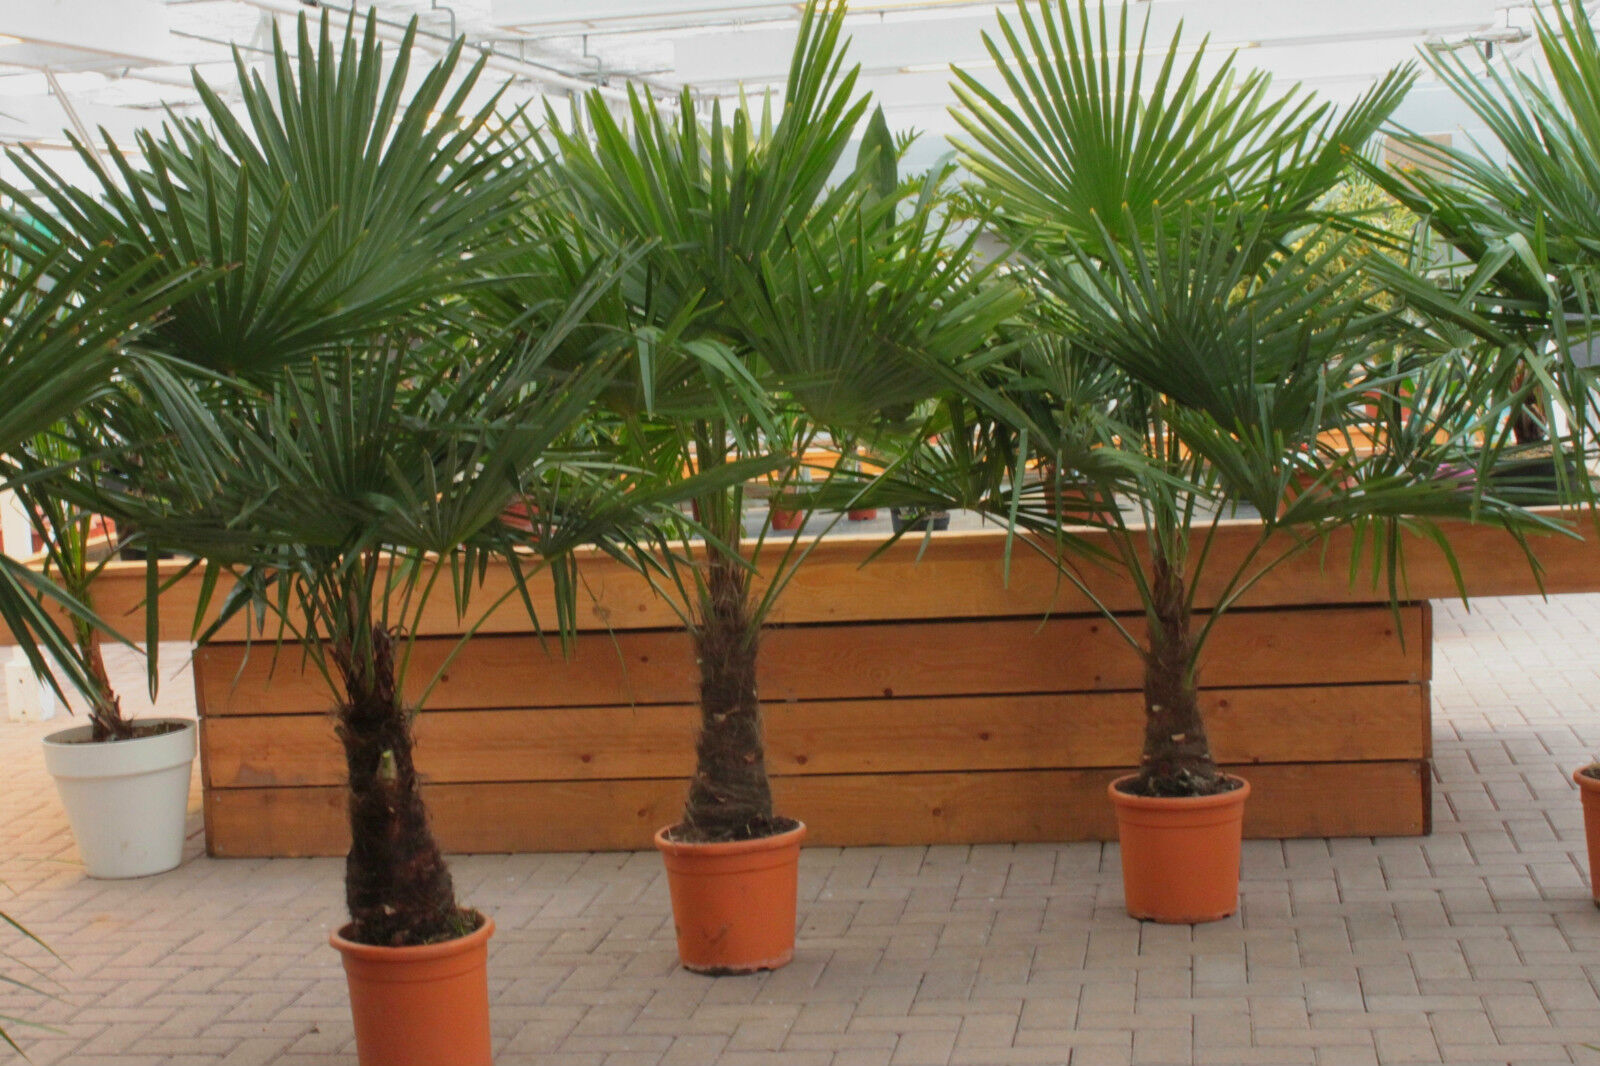 winterharte palme 180cm xxl hanfpalme 18 c trachycarpus fortunei palmen ebay. Black Bedroom Furniture Sets. Home Design Ideas